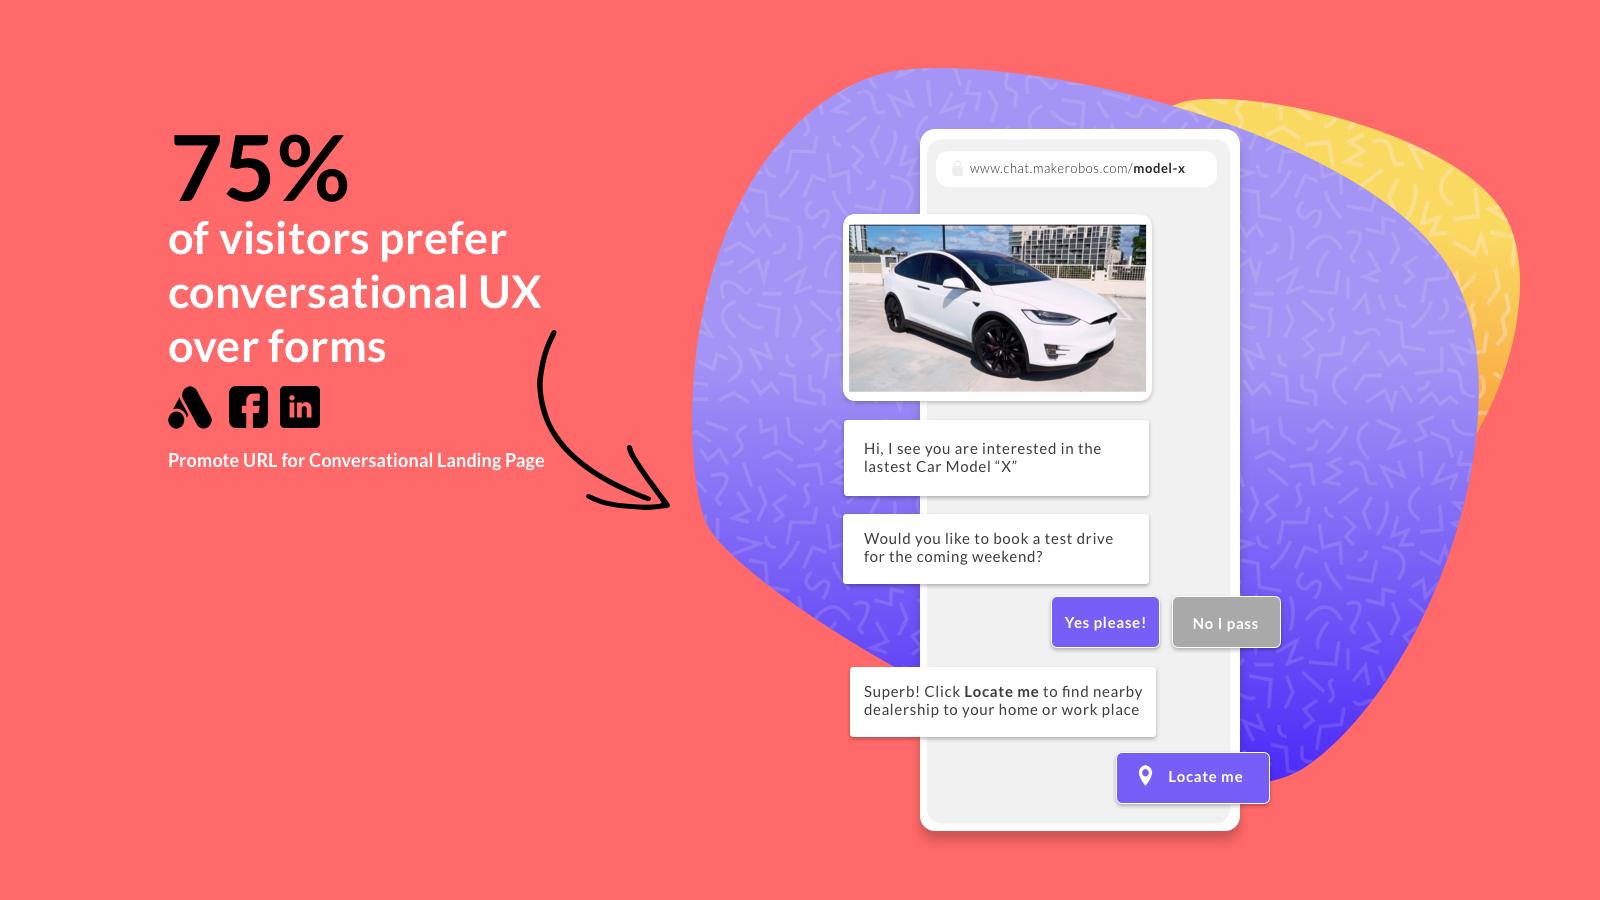 Conversational Landing Page - Secret Marketing Tool